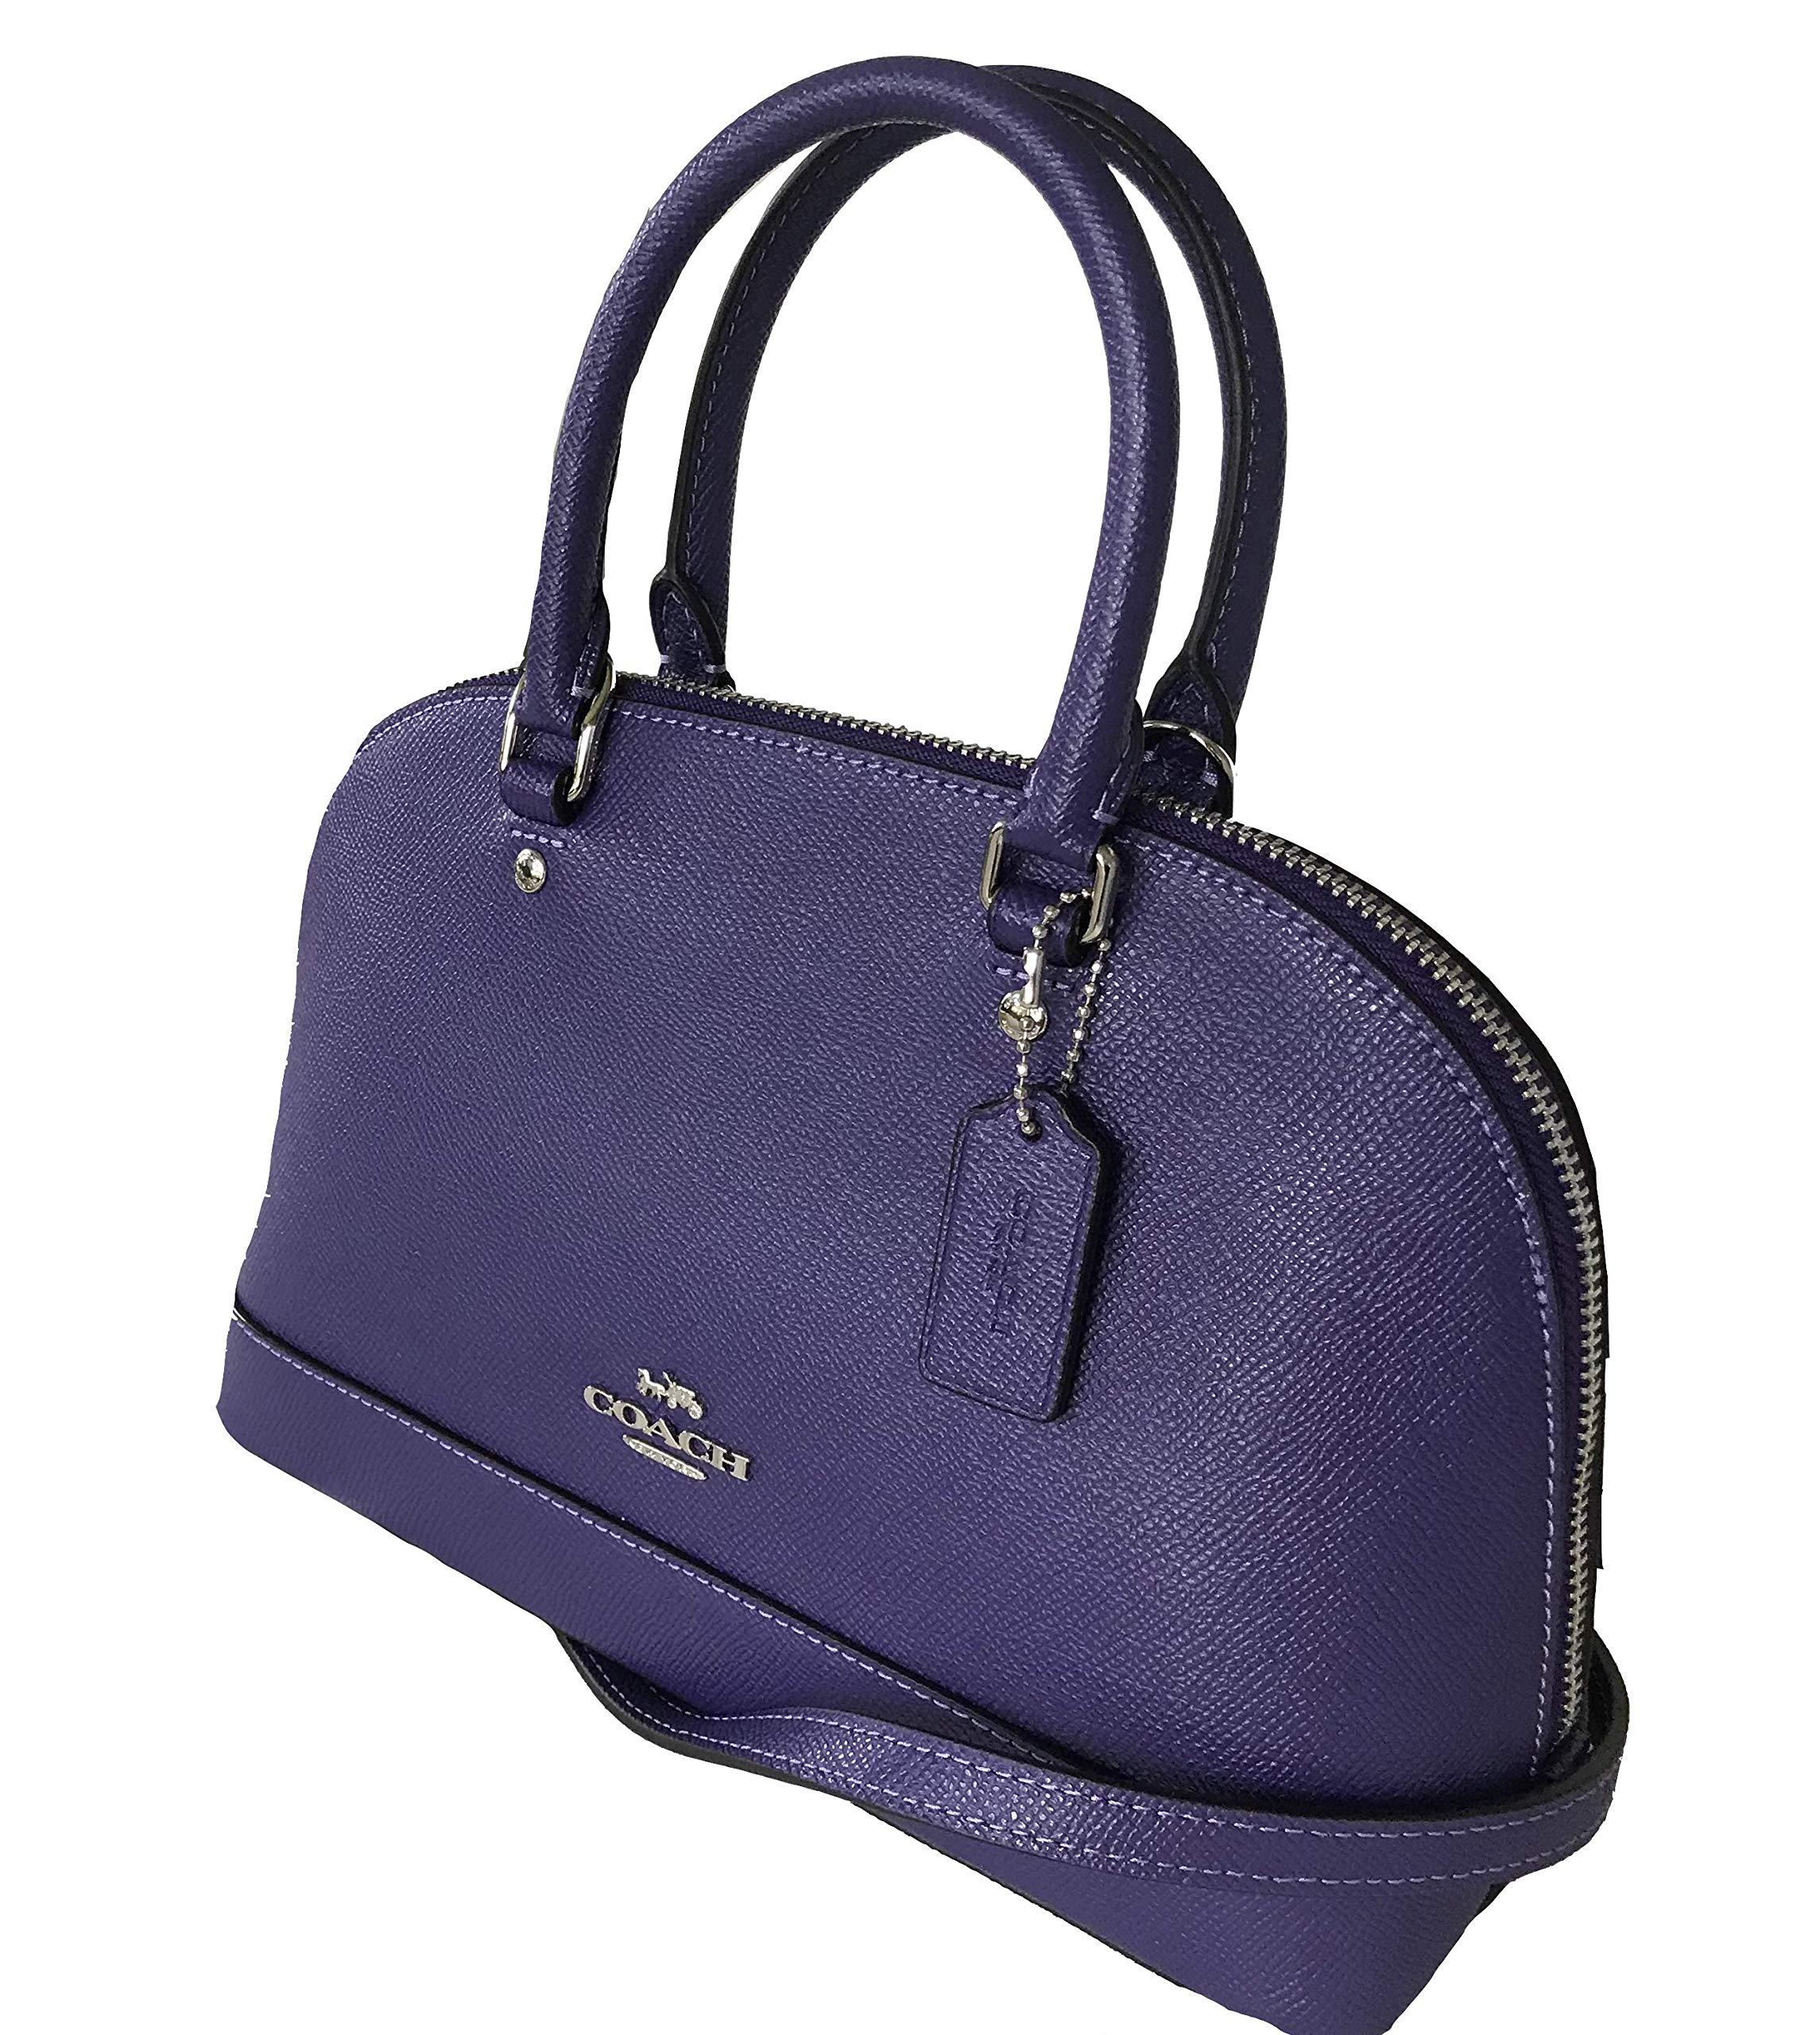 7b4e6cb83fc4 Coach Women s Shoulder Inclined Shoulder Handbag Mini Sierra Satchel Purse